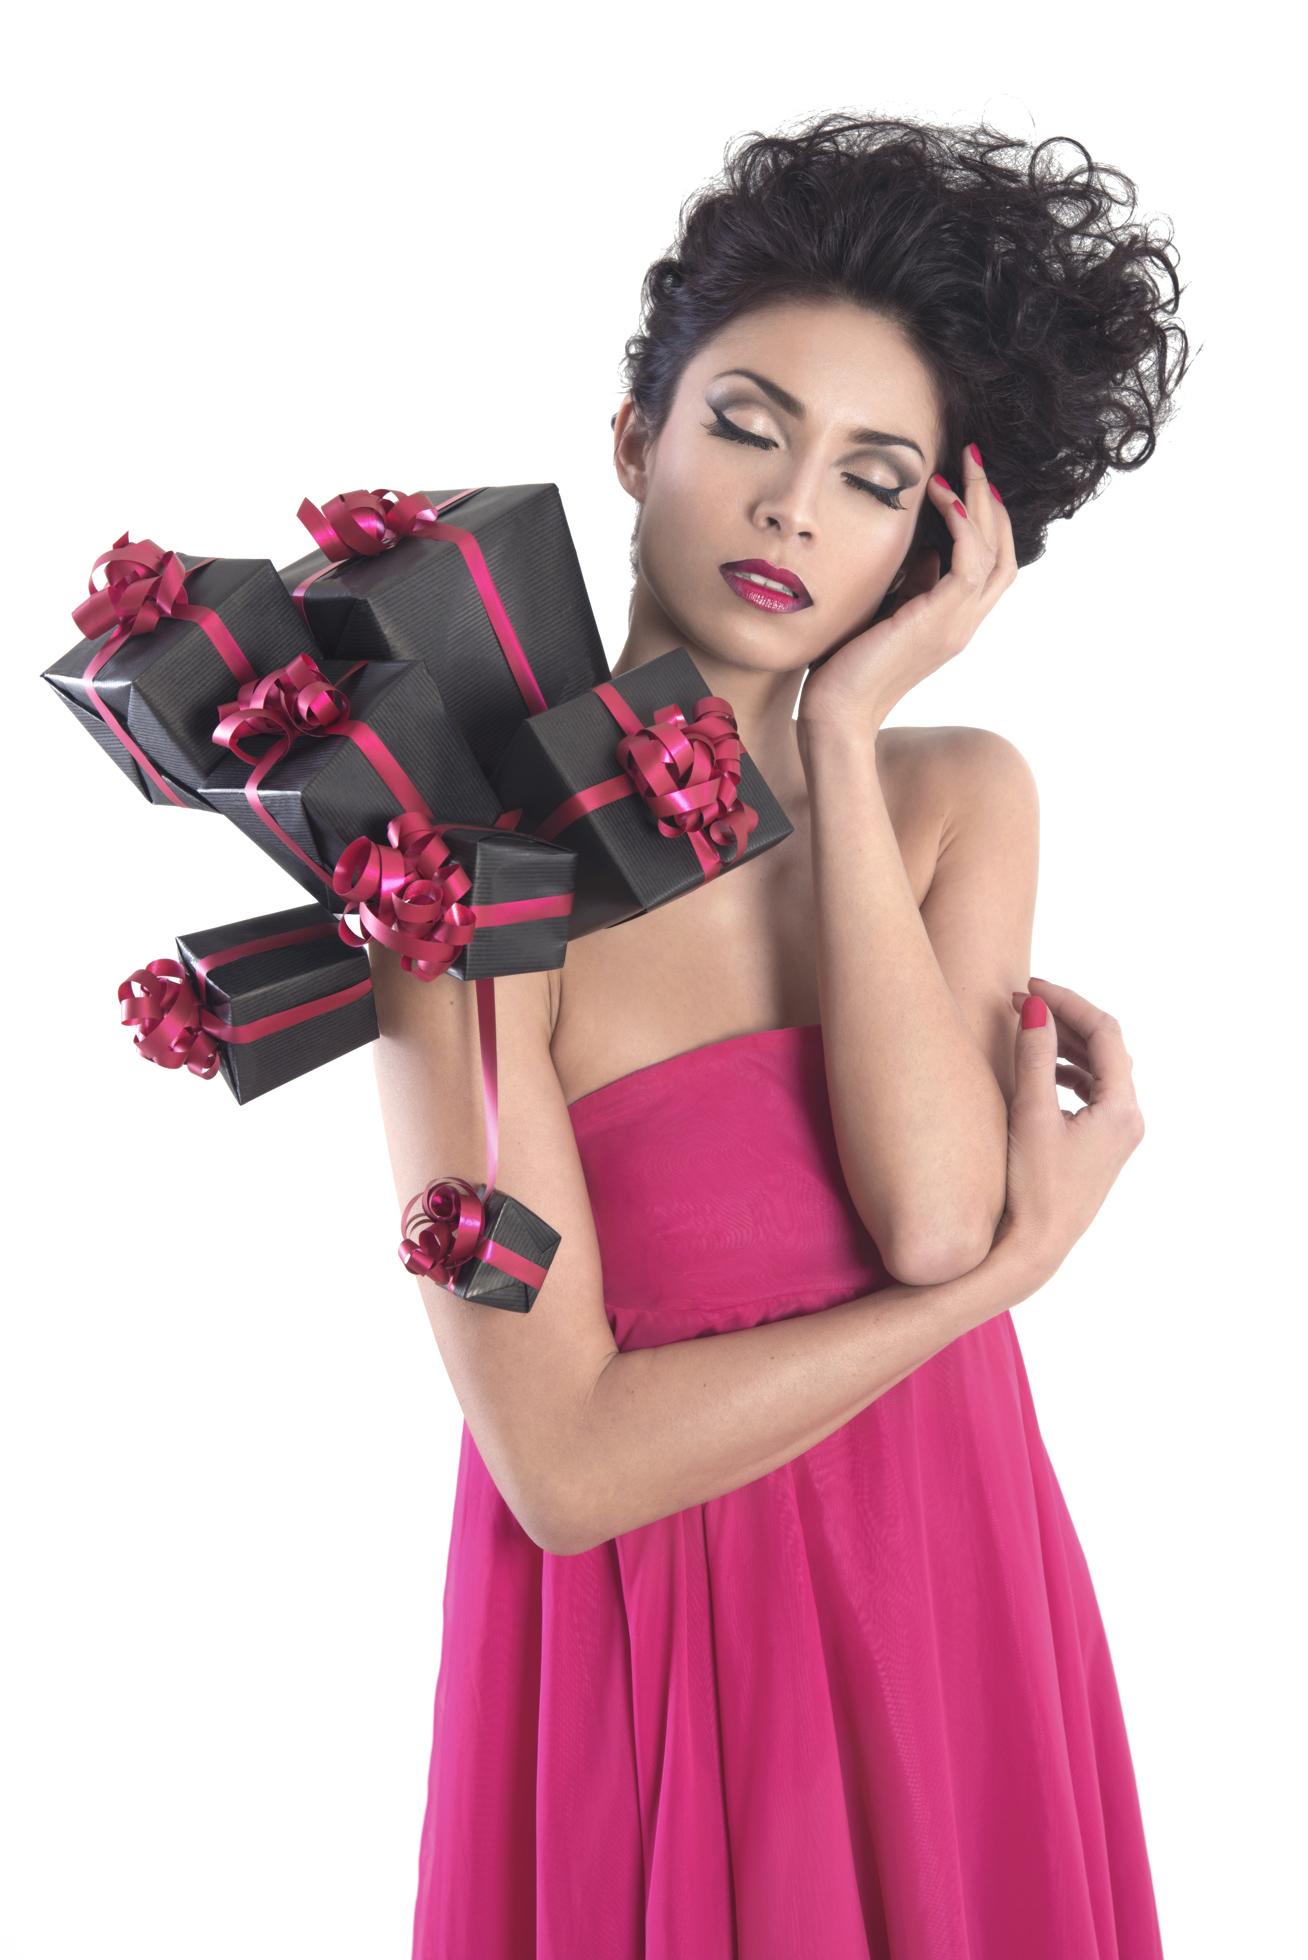 Be my Valentine Photographe © Yann Malotti - Assistante © Alexandra Vallegant - Coiffeuse © Sylvie Pastore - Mannequin : Issia - Styliste photo © Stephanie Cappellini - Stylisme © Atelier Sylphe Corsets & Stephanie Cappellini pour 13e Lune